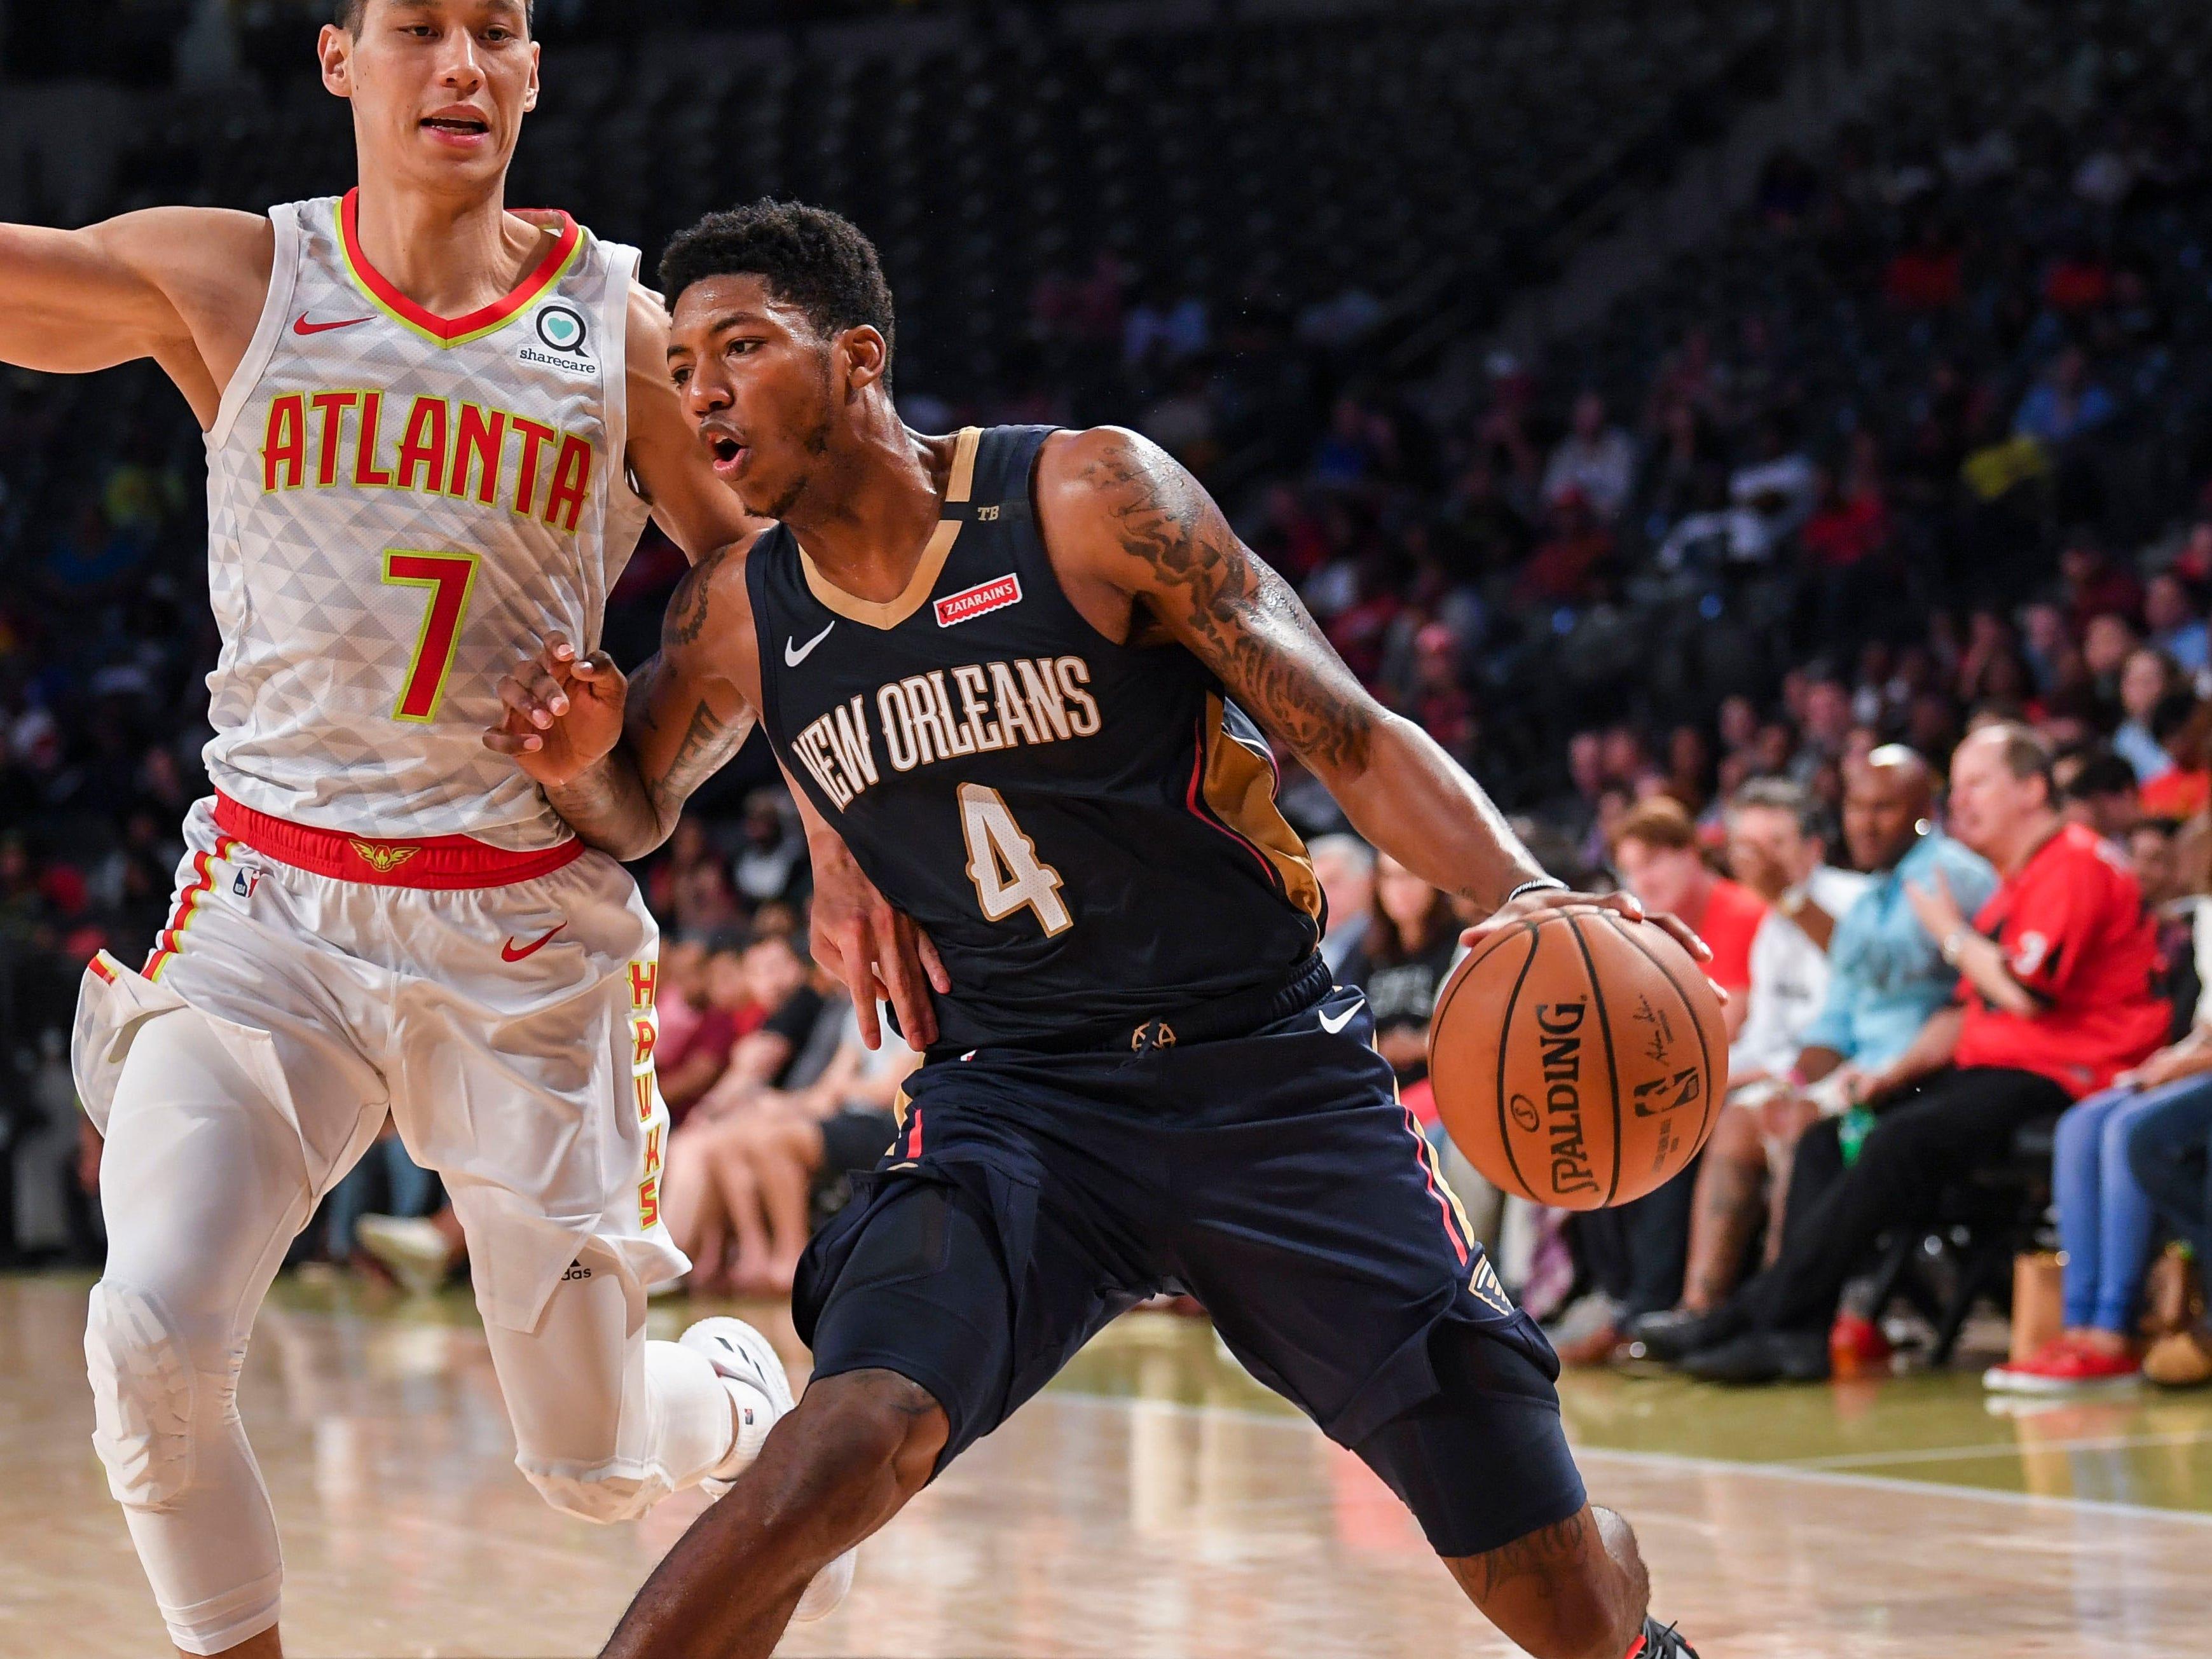 Elfrid Payton, New Orleans Pelicans — 24 (born 2/22/1994)